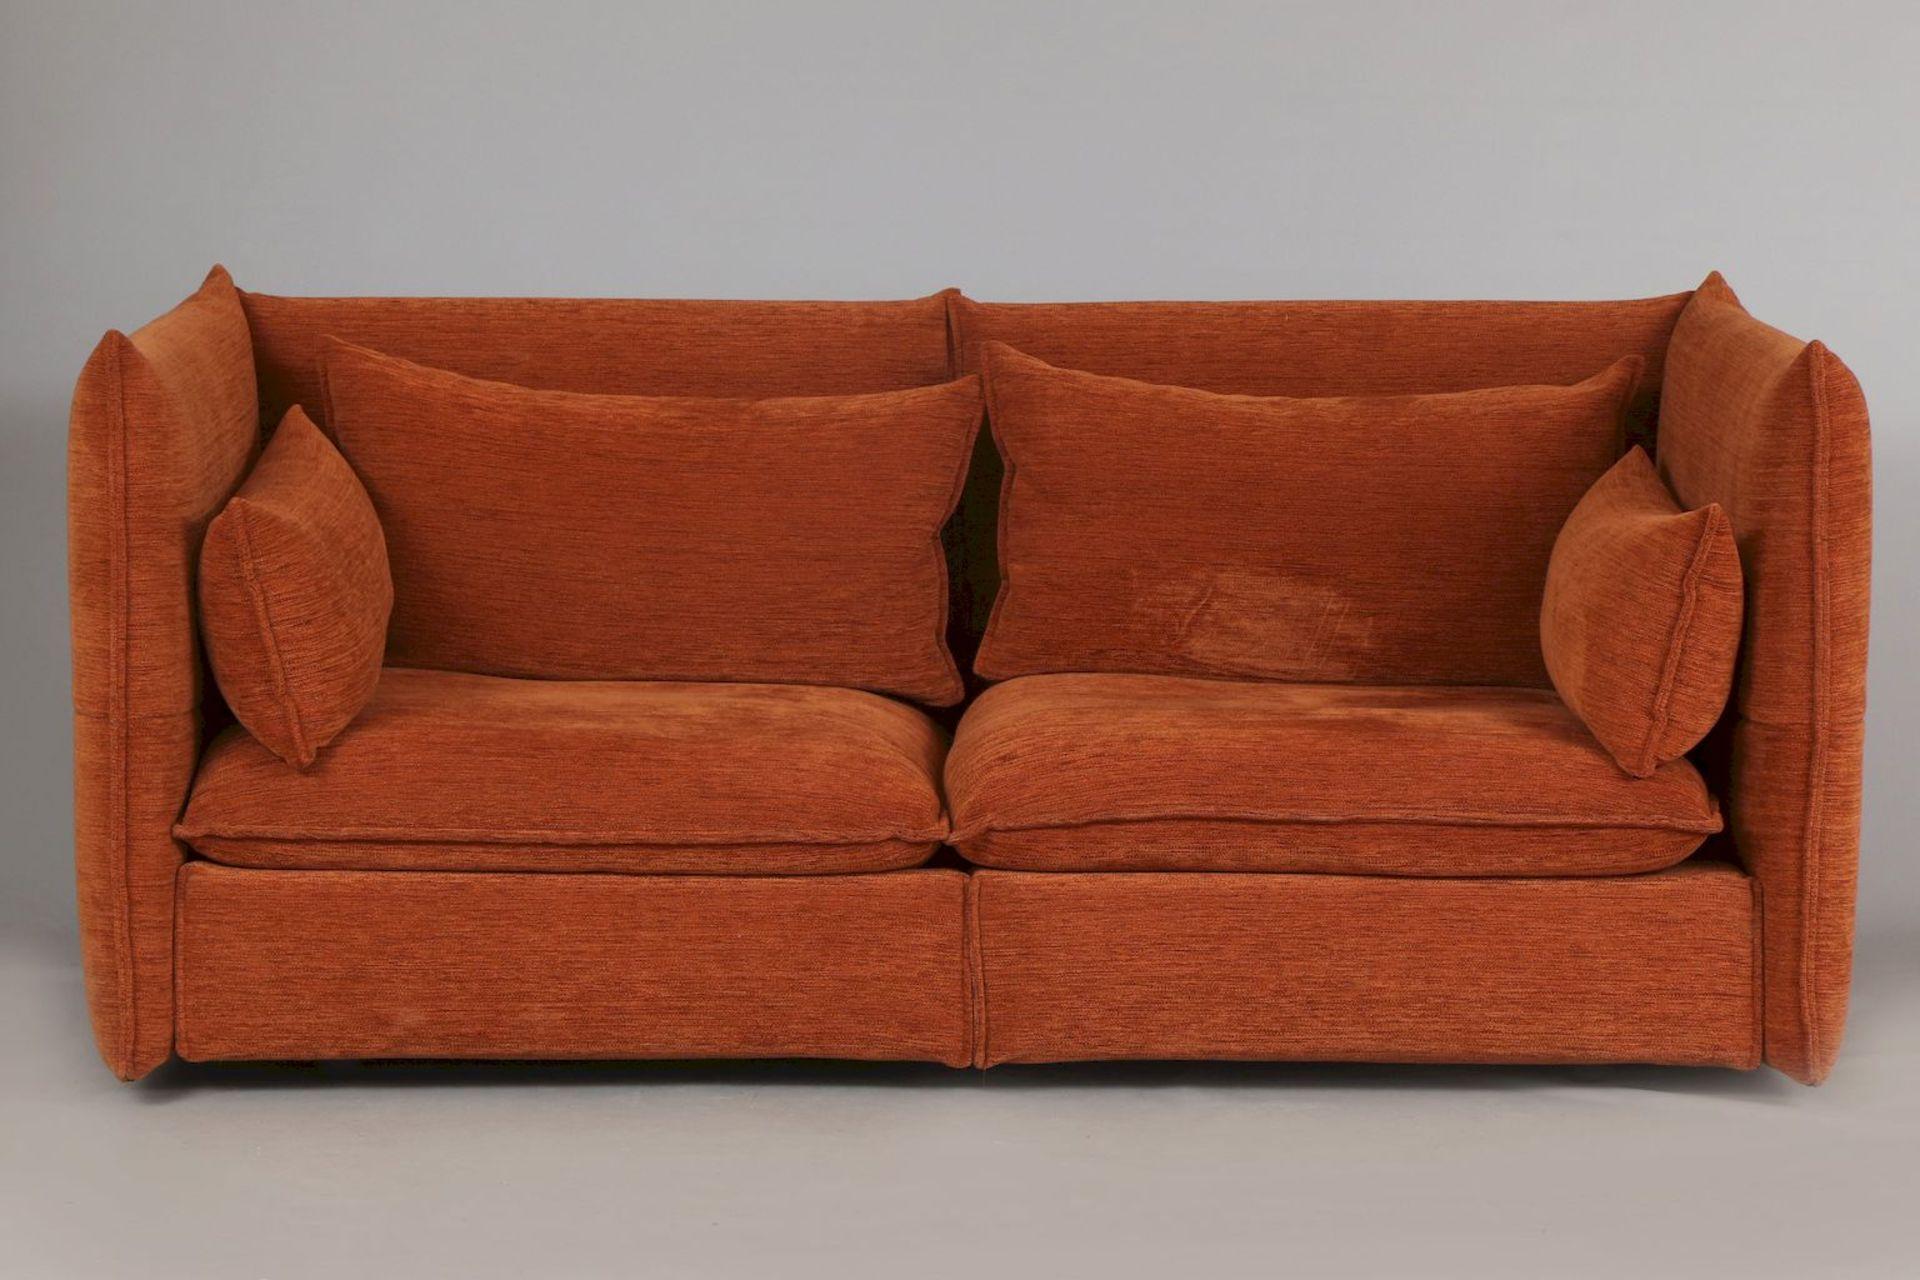 EDWARD BARBER & JAY OSGERBY Sofa ¨Mariposa¨ (2014)